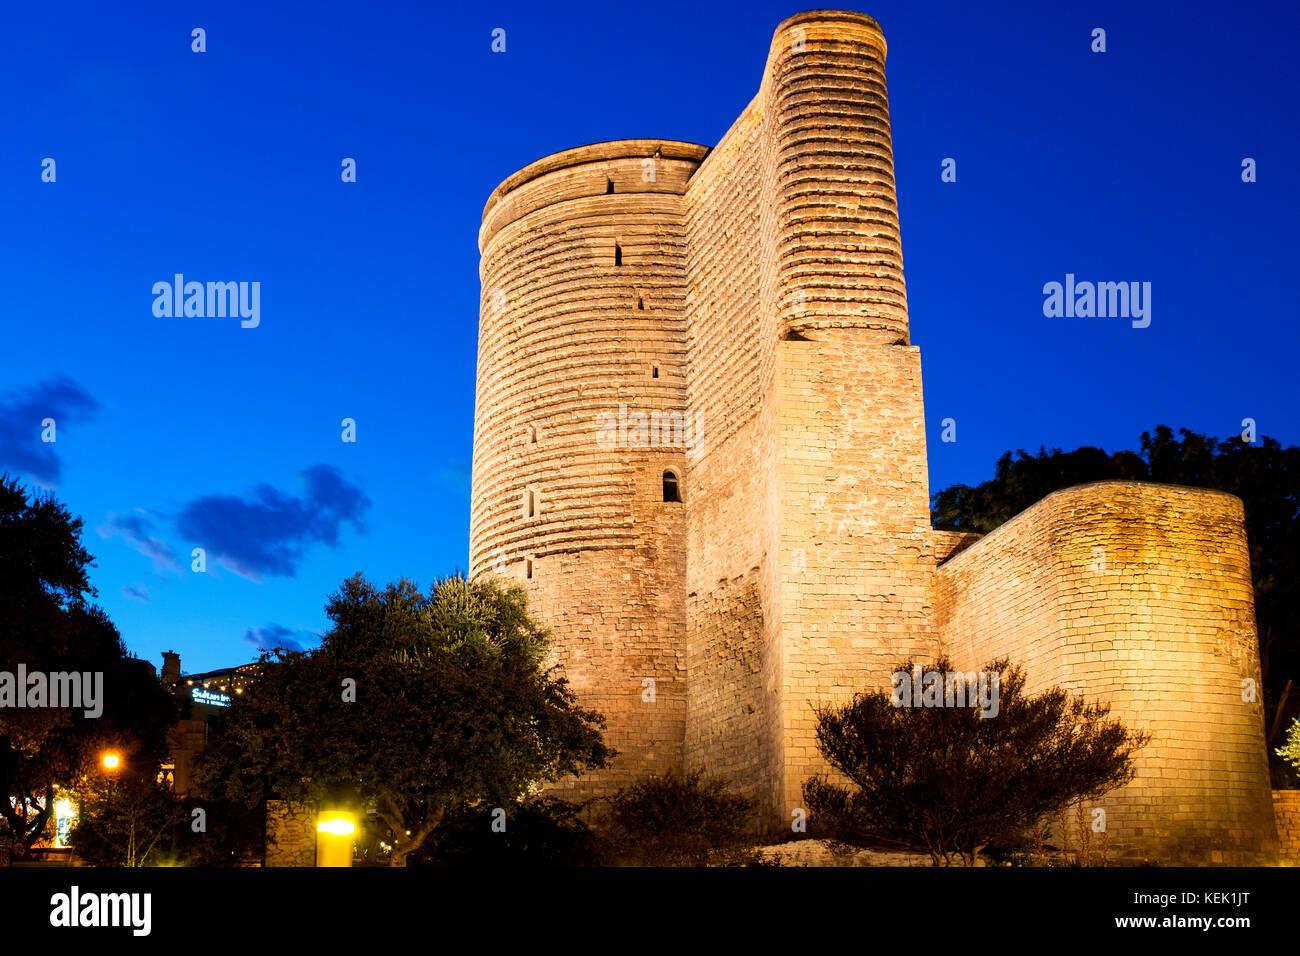 Maiden Tower, Baku, Azerbaijan - Stock Image